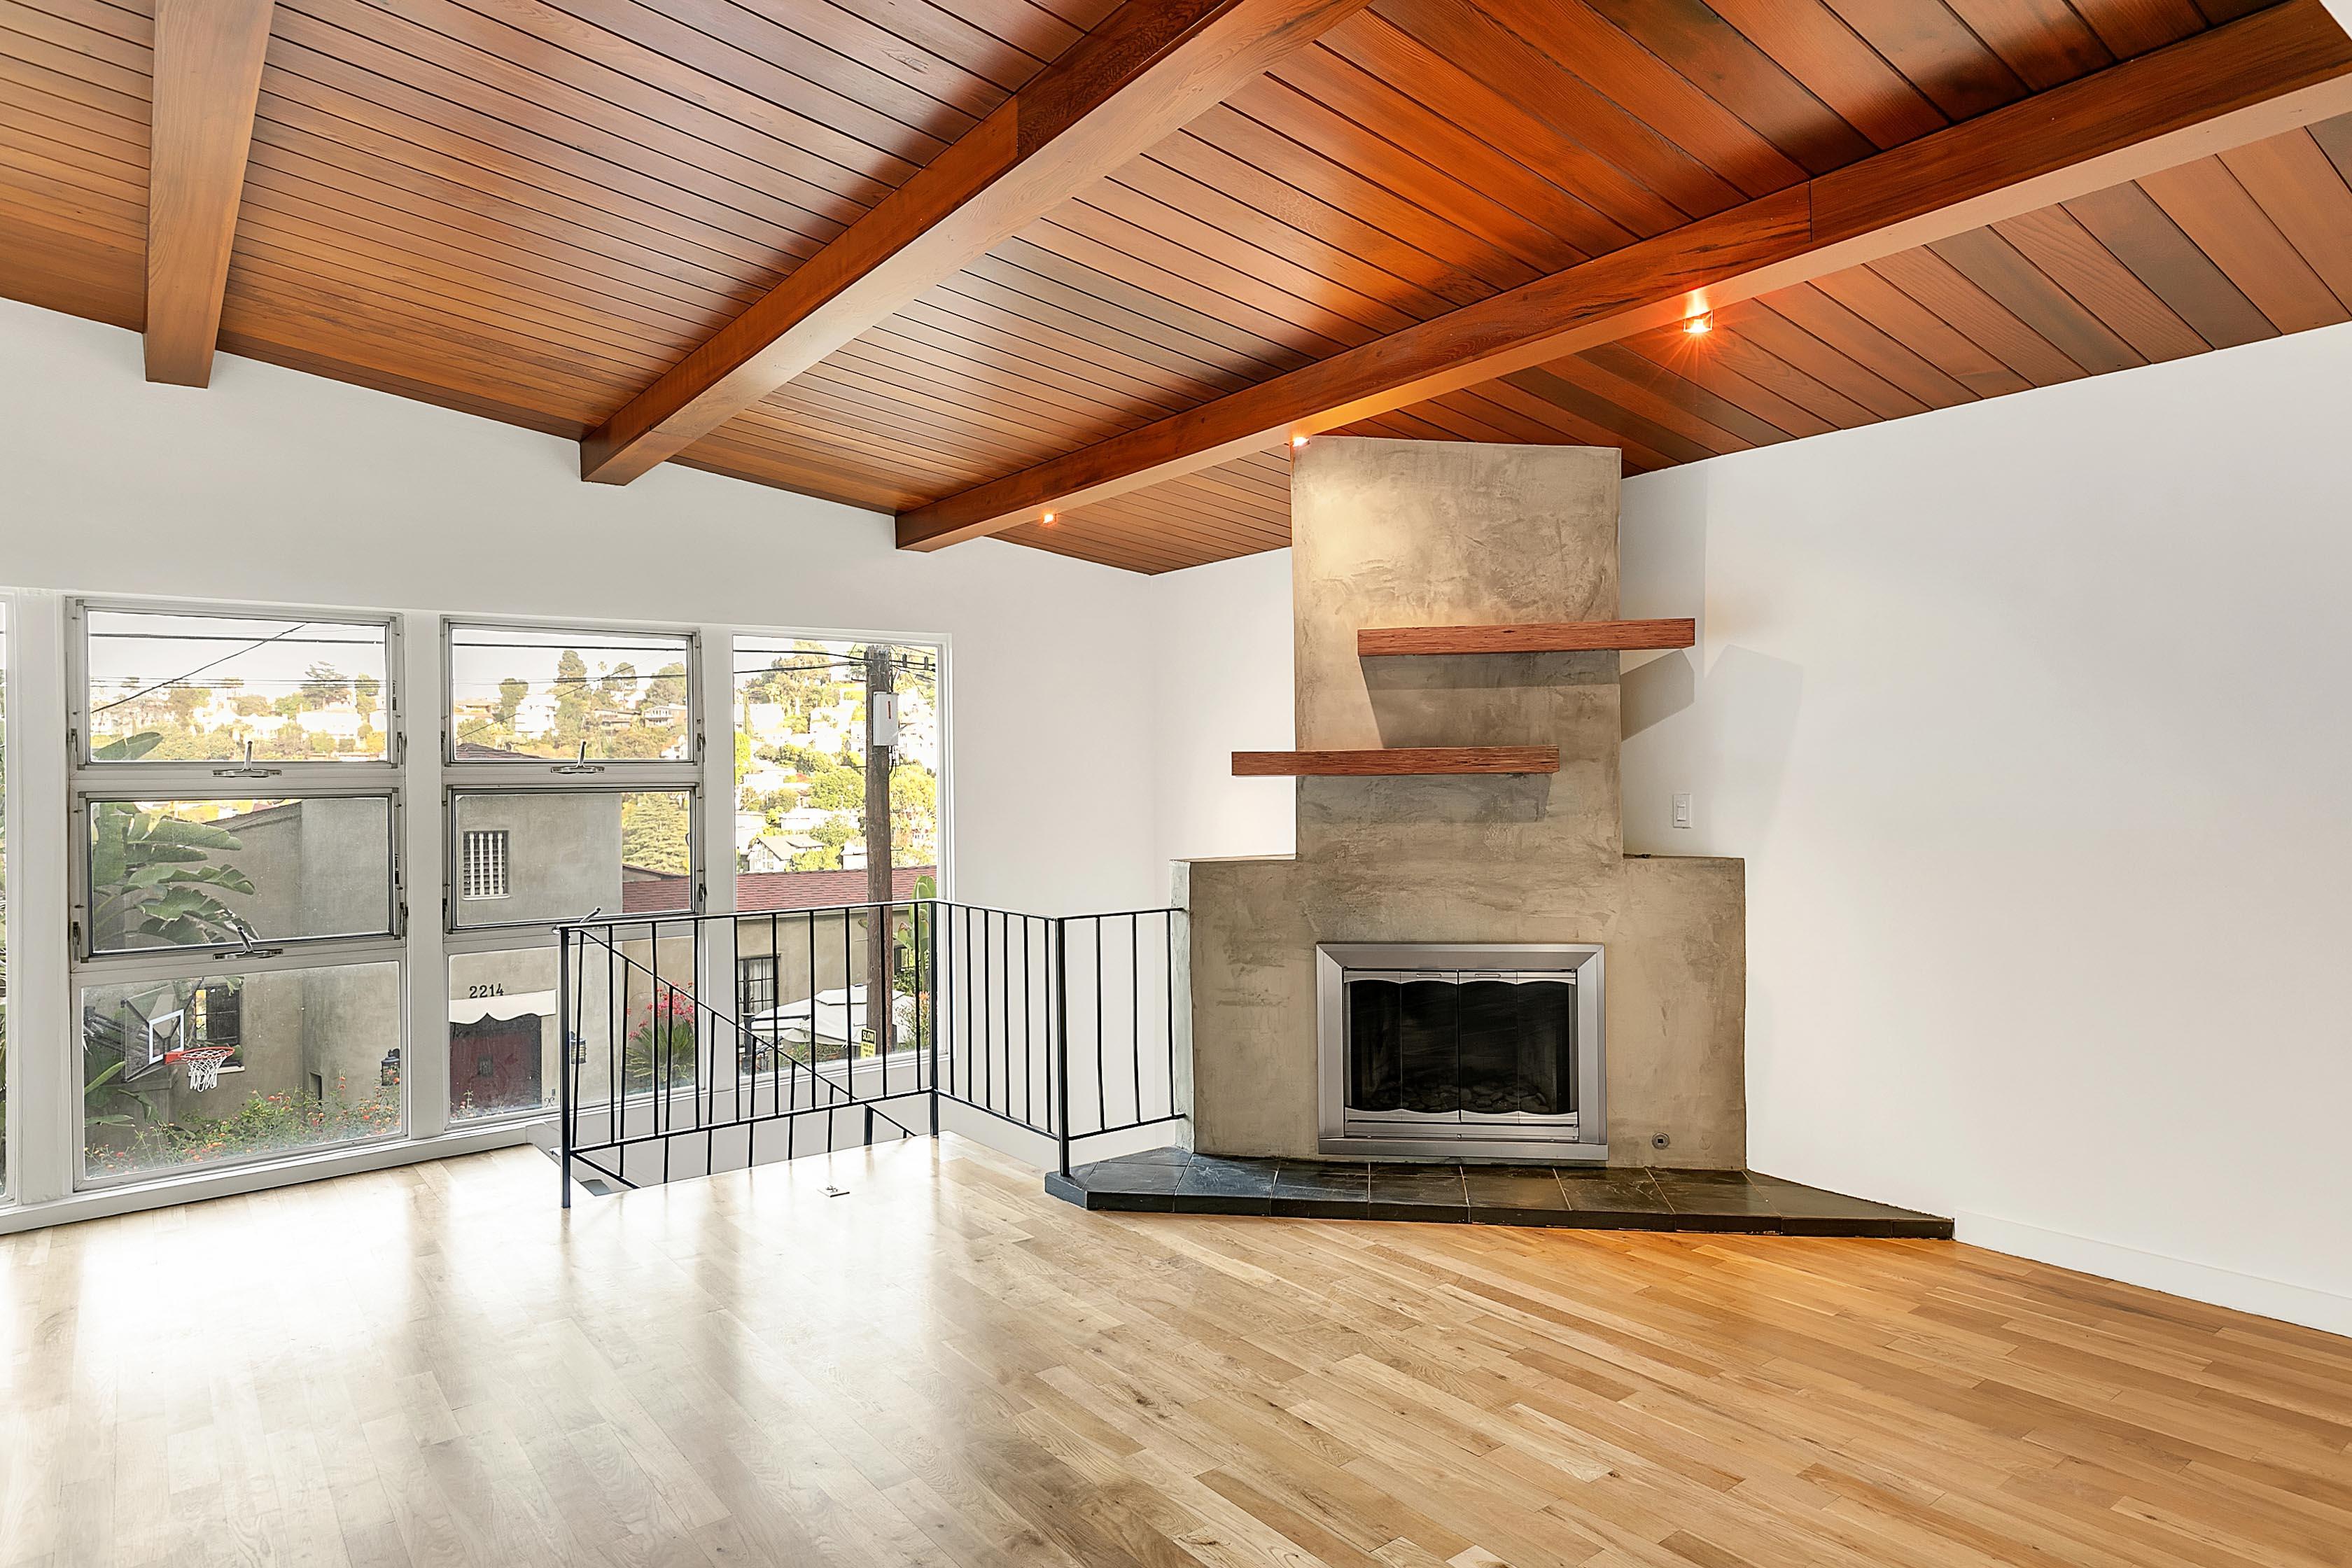 Three Story Mid-Century Modern Abode | Bonus Studio Space| 2 Car Garage | Deck W/ Views | Jacuzzi Included!